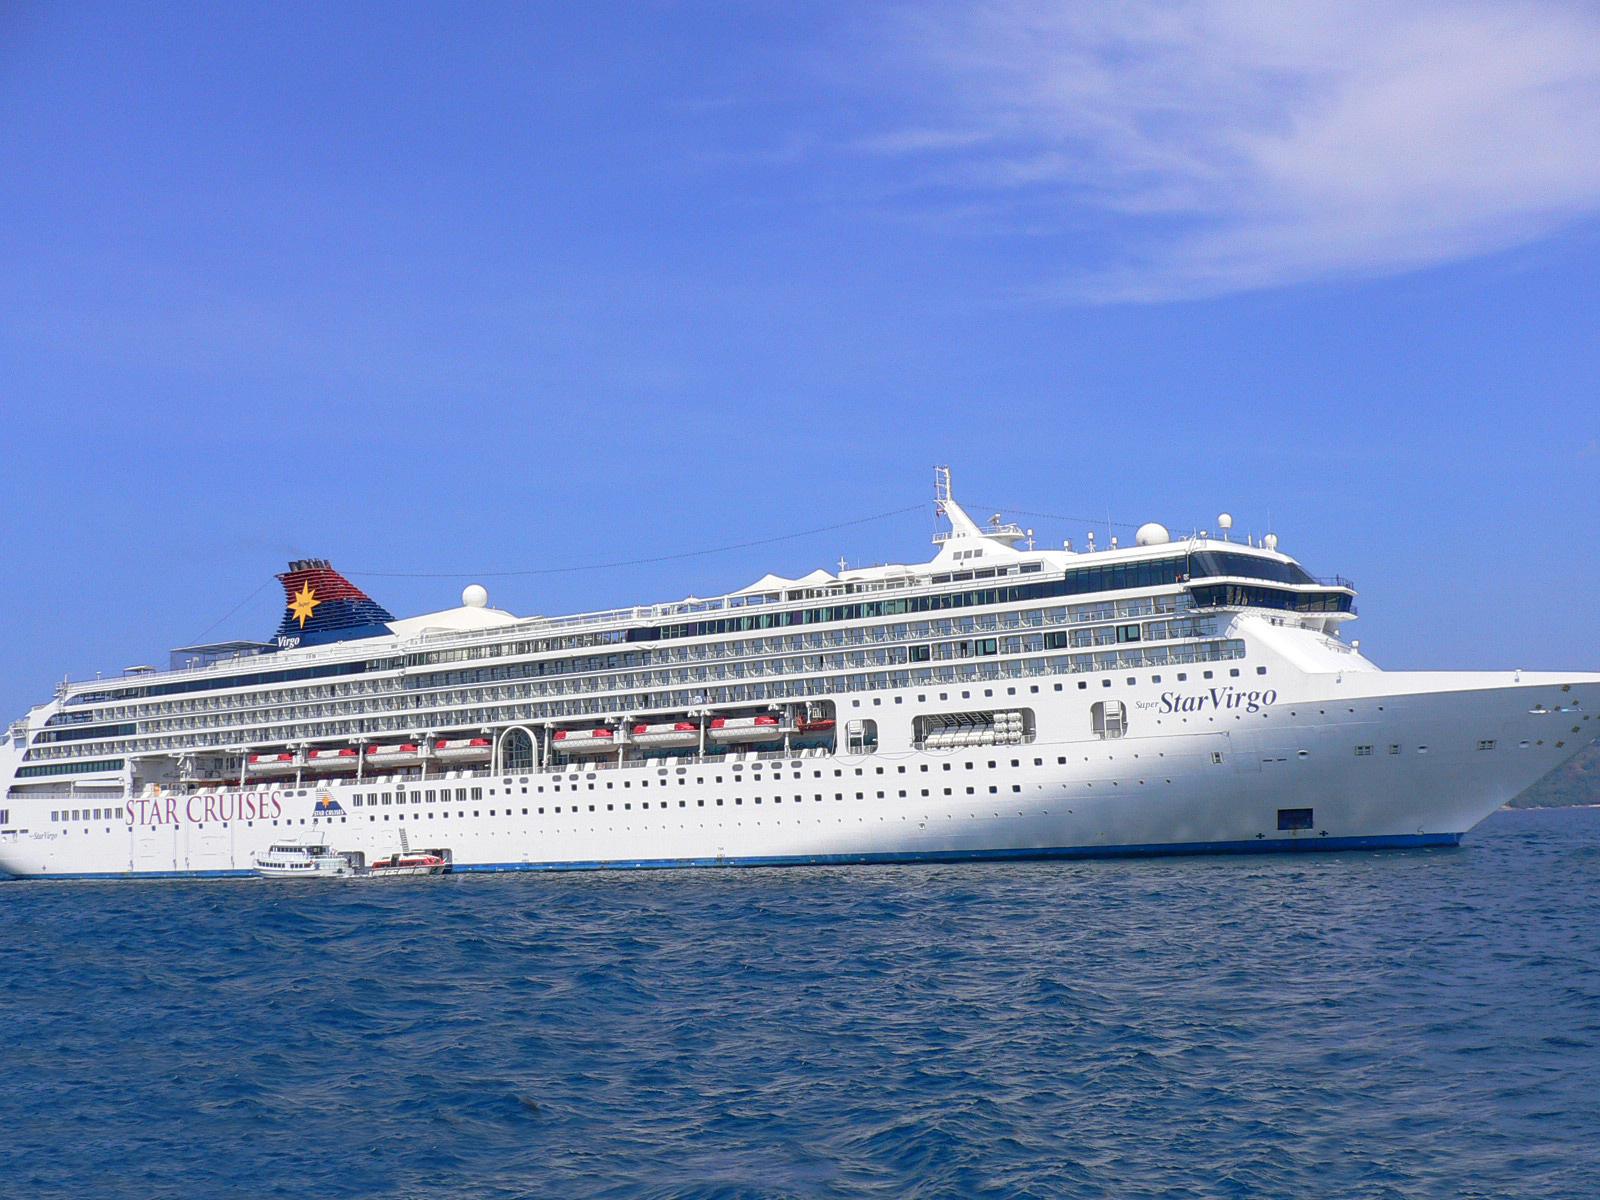 All celebrity ships